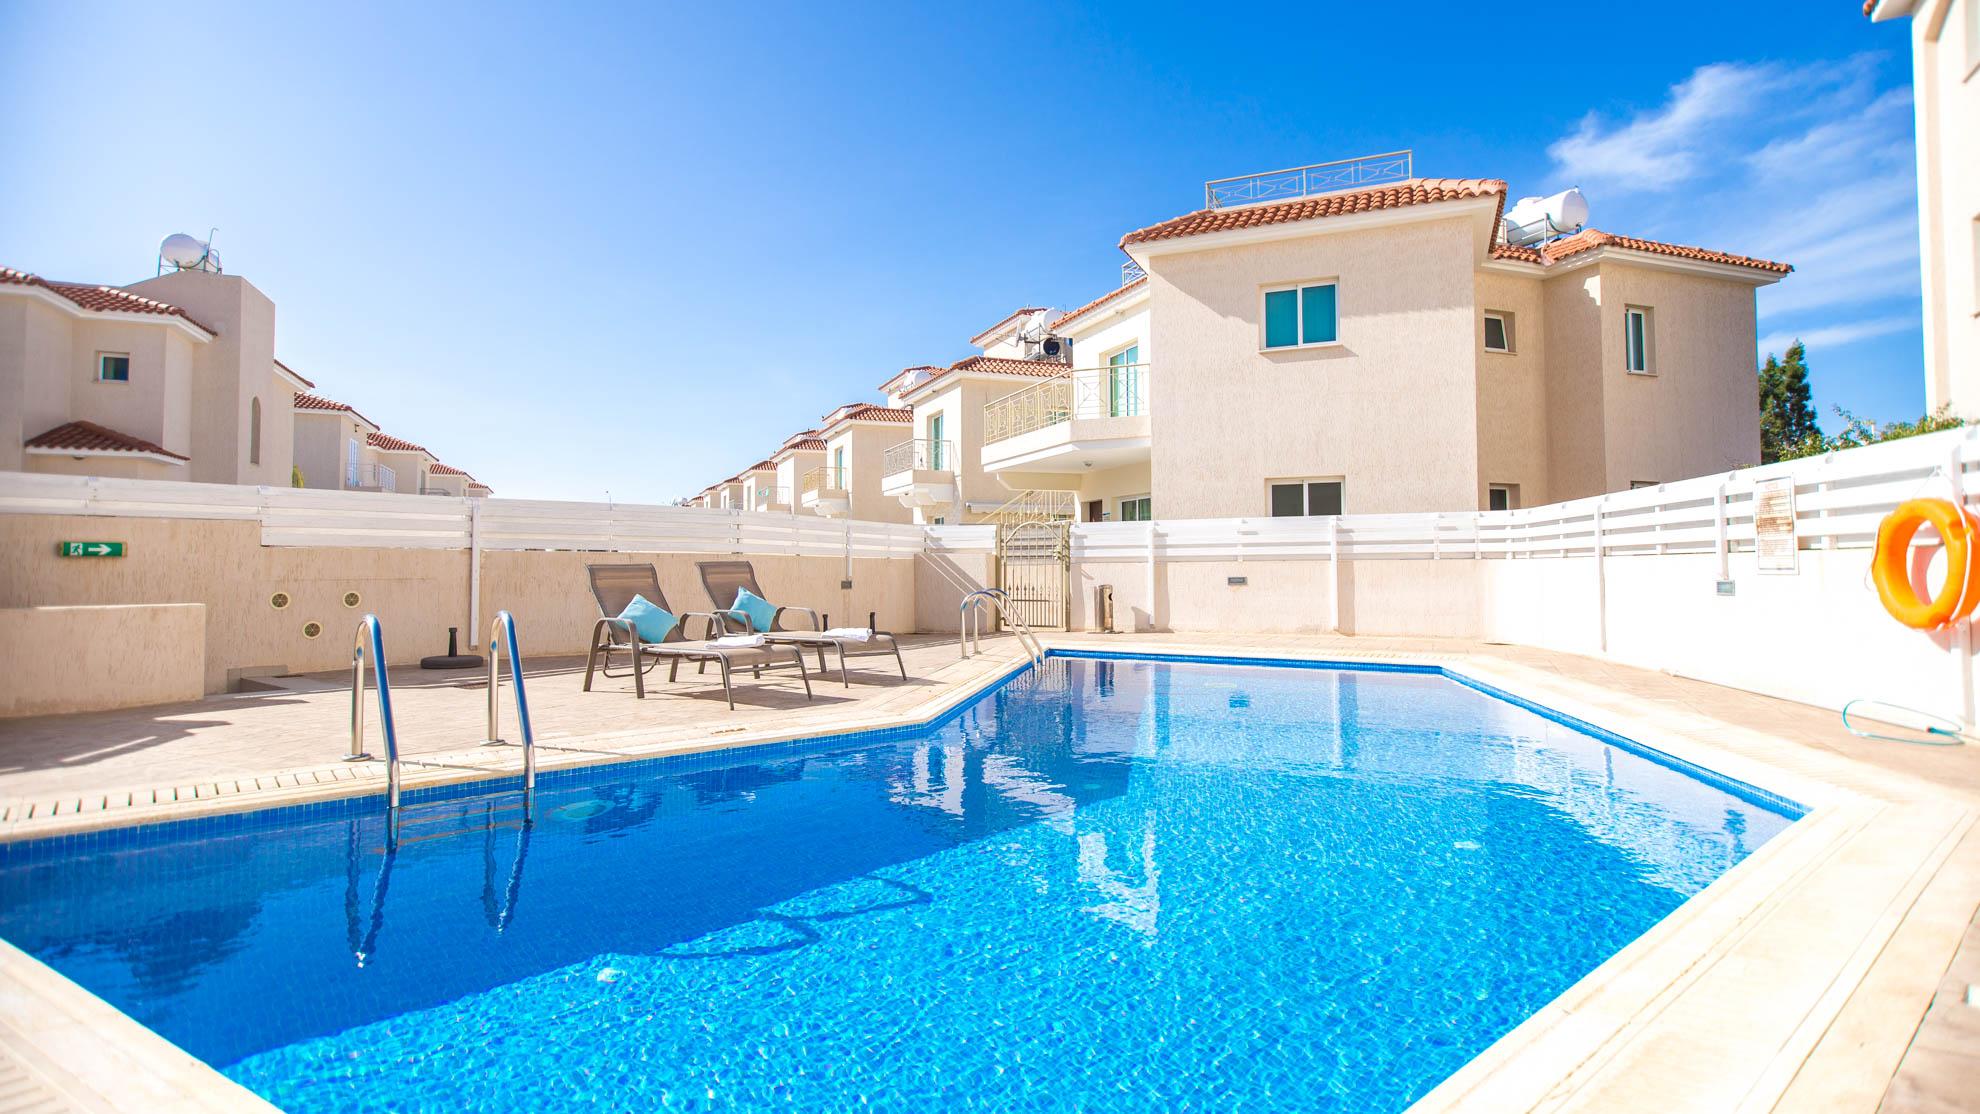 Luxury PRIVATE VILLA in Cyprus, Apartment 175